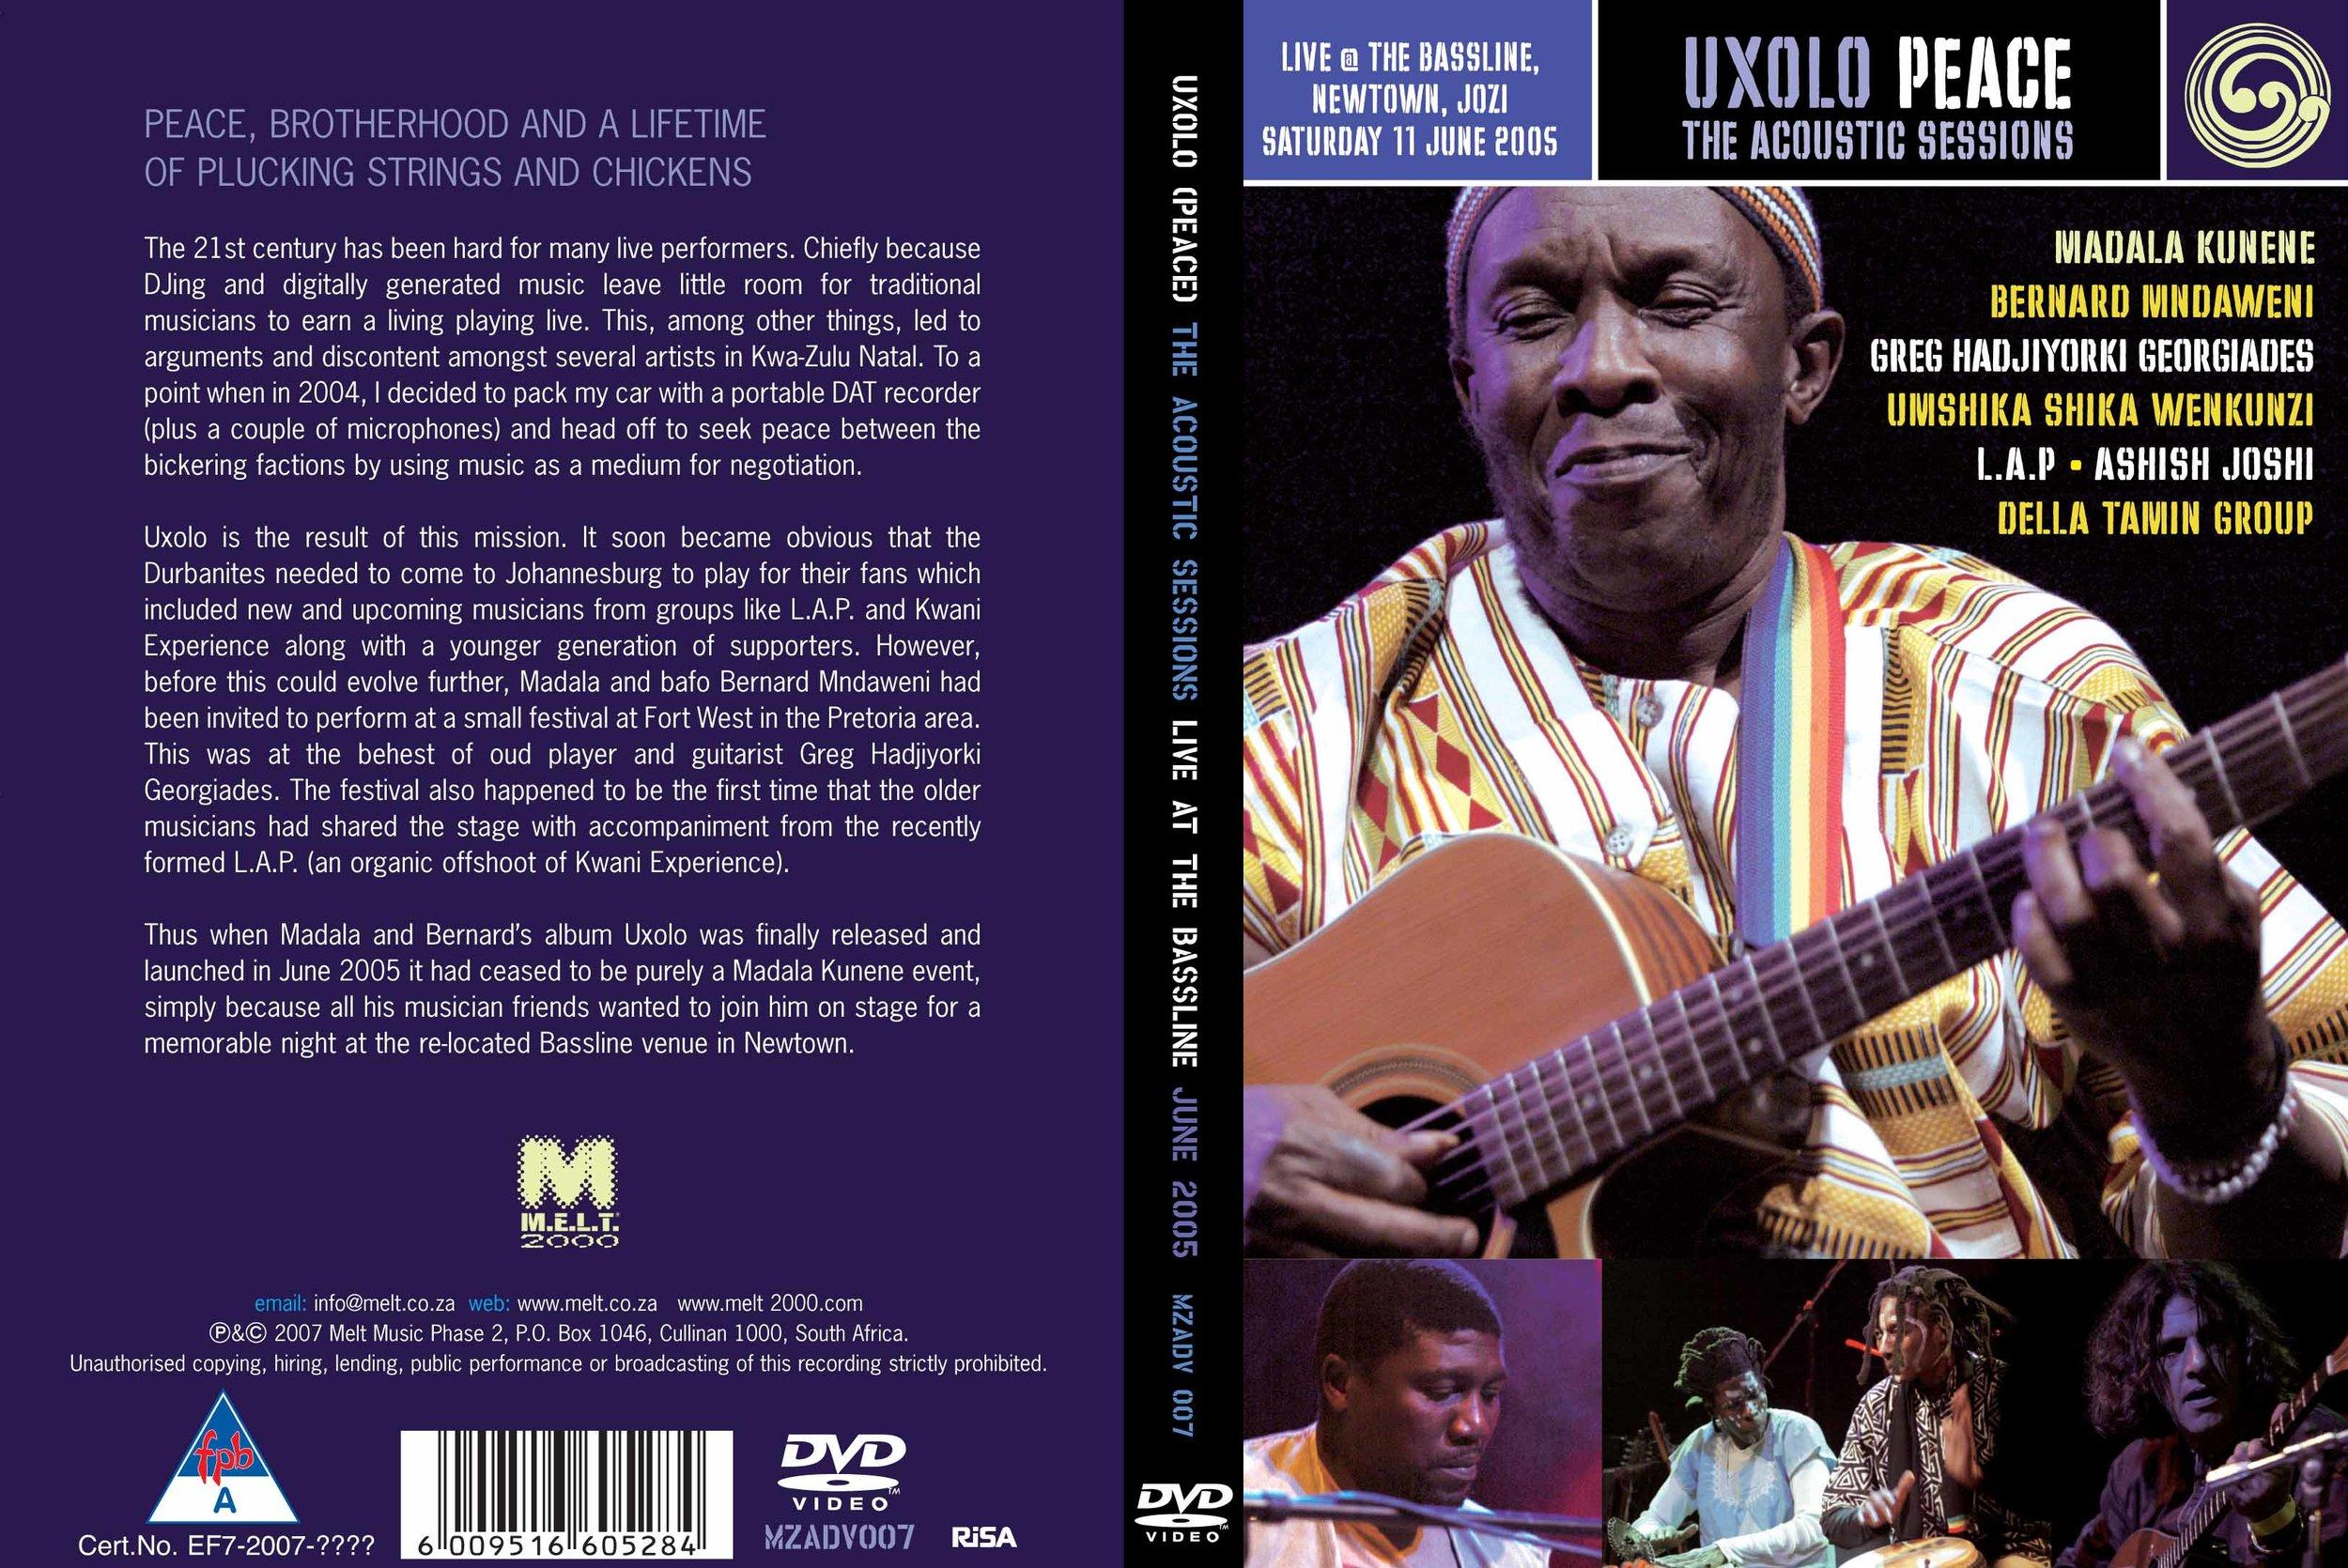 Madala MZADV 007 Uxolo DVD Cover4x4.jpg